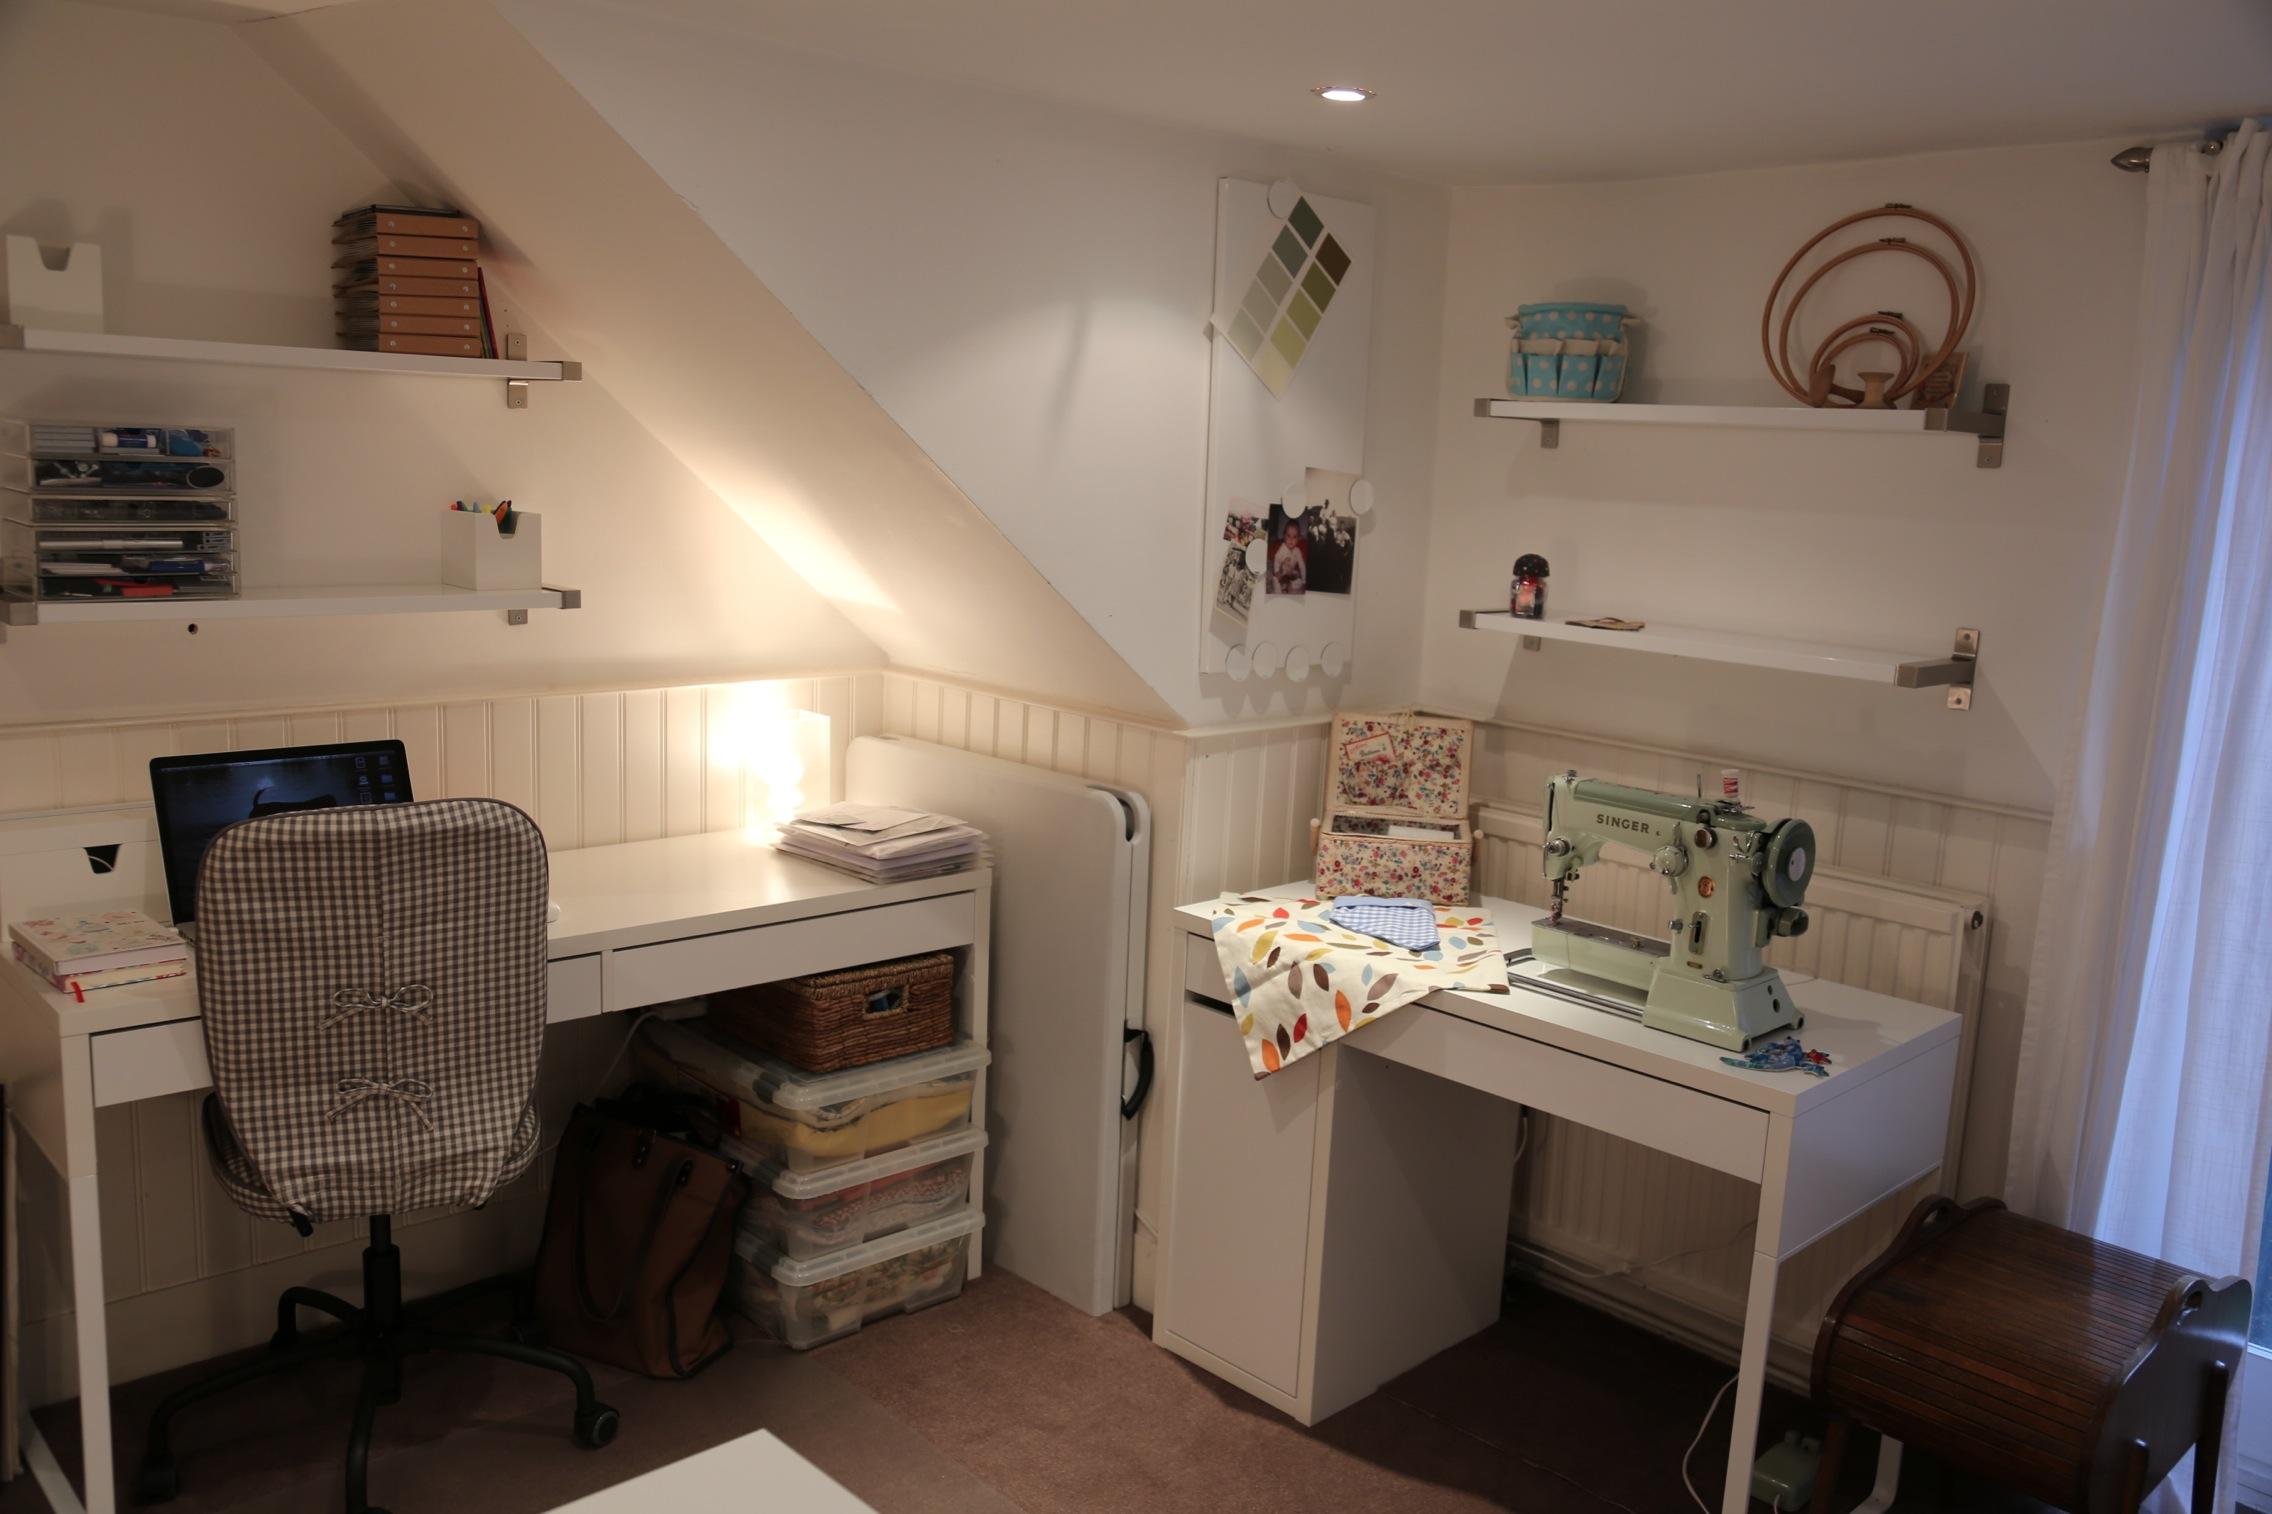 Singer 320k Sewing Machine Tinyinc 401 Threading Diagram My Wonderful Work Room